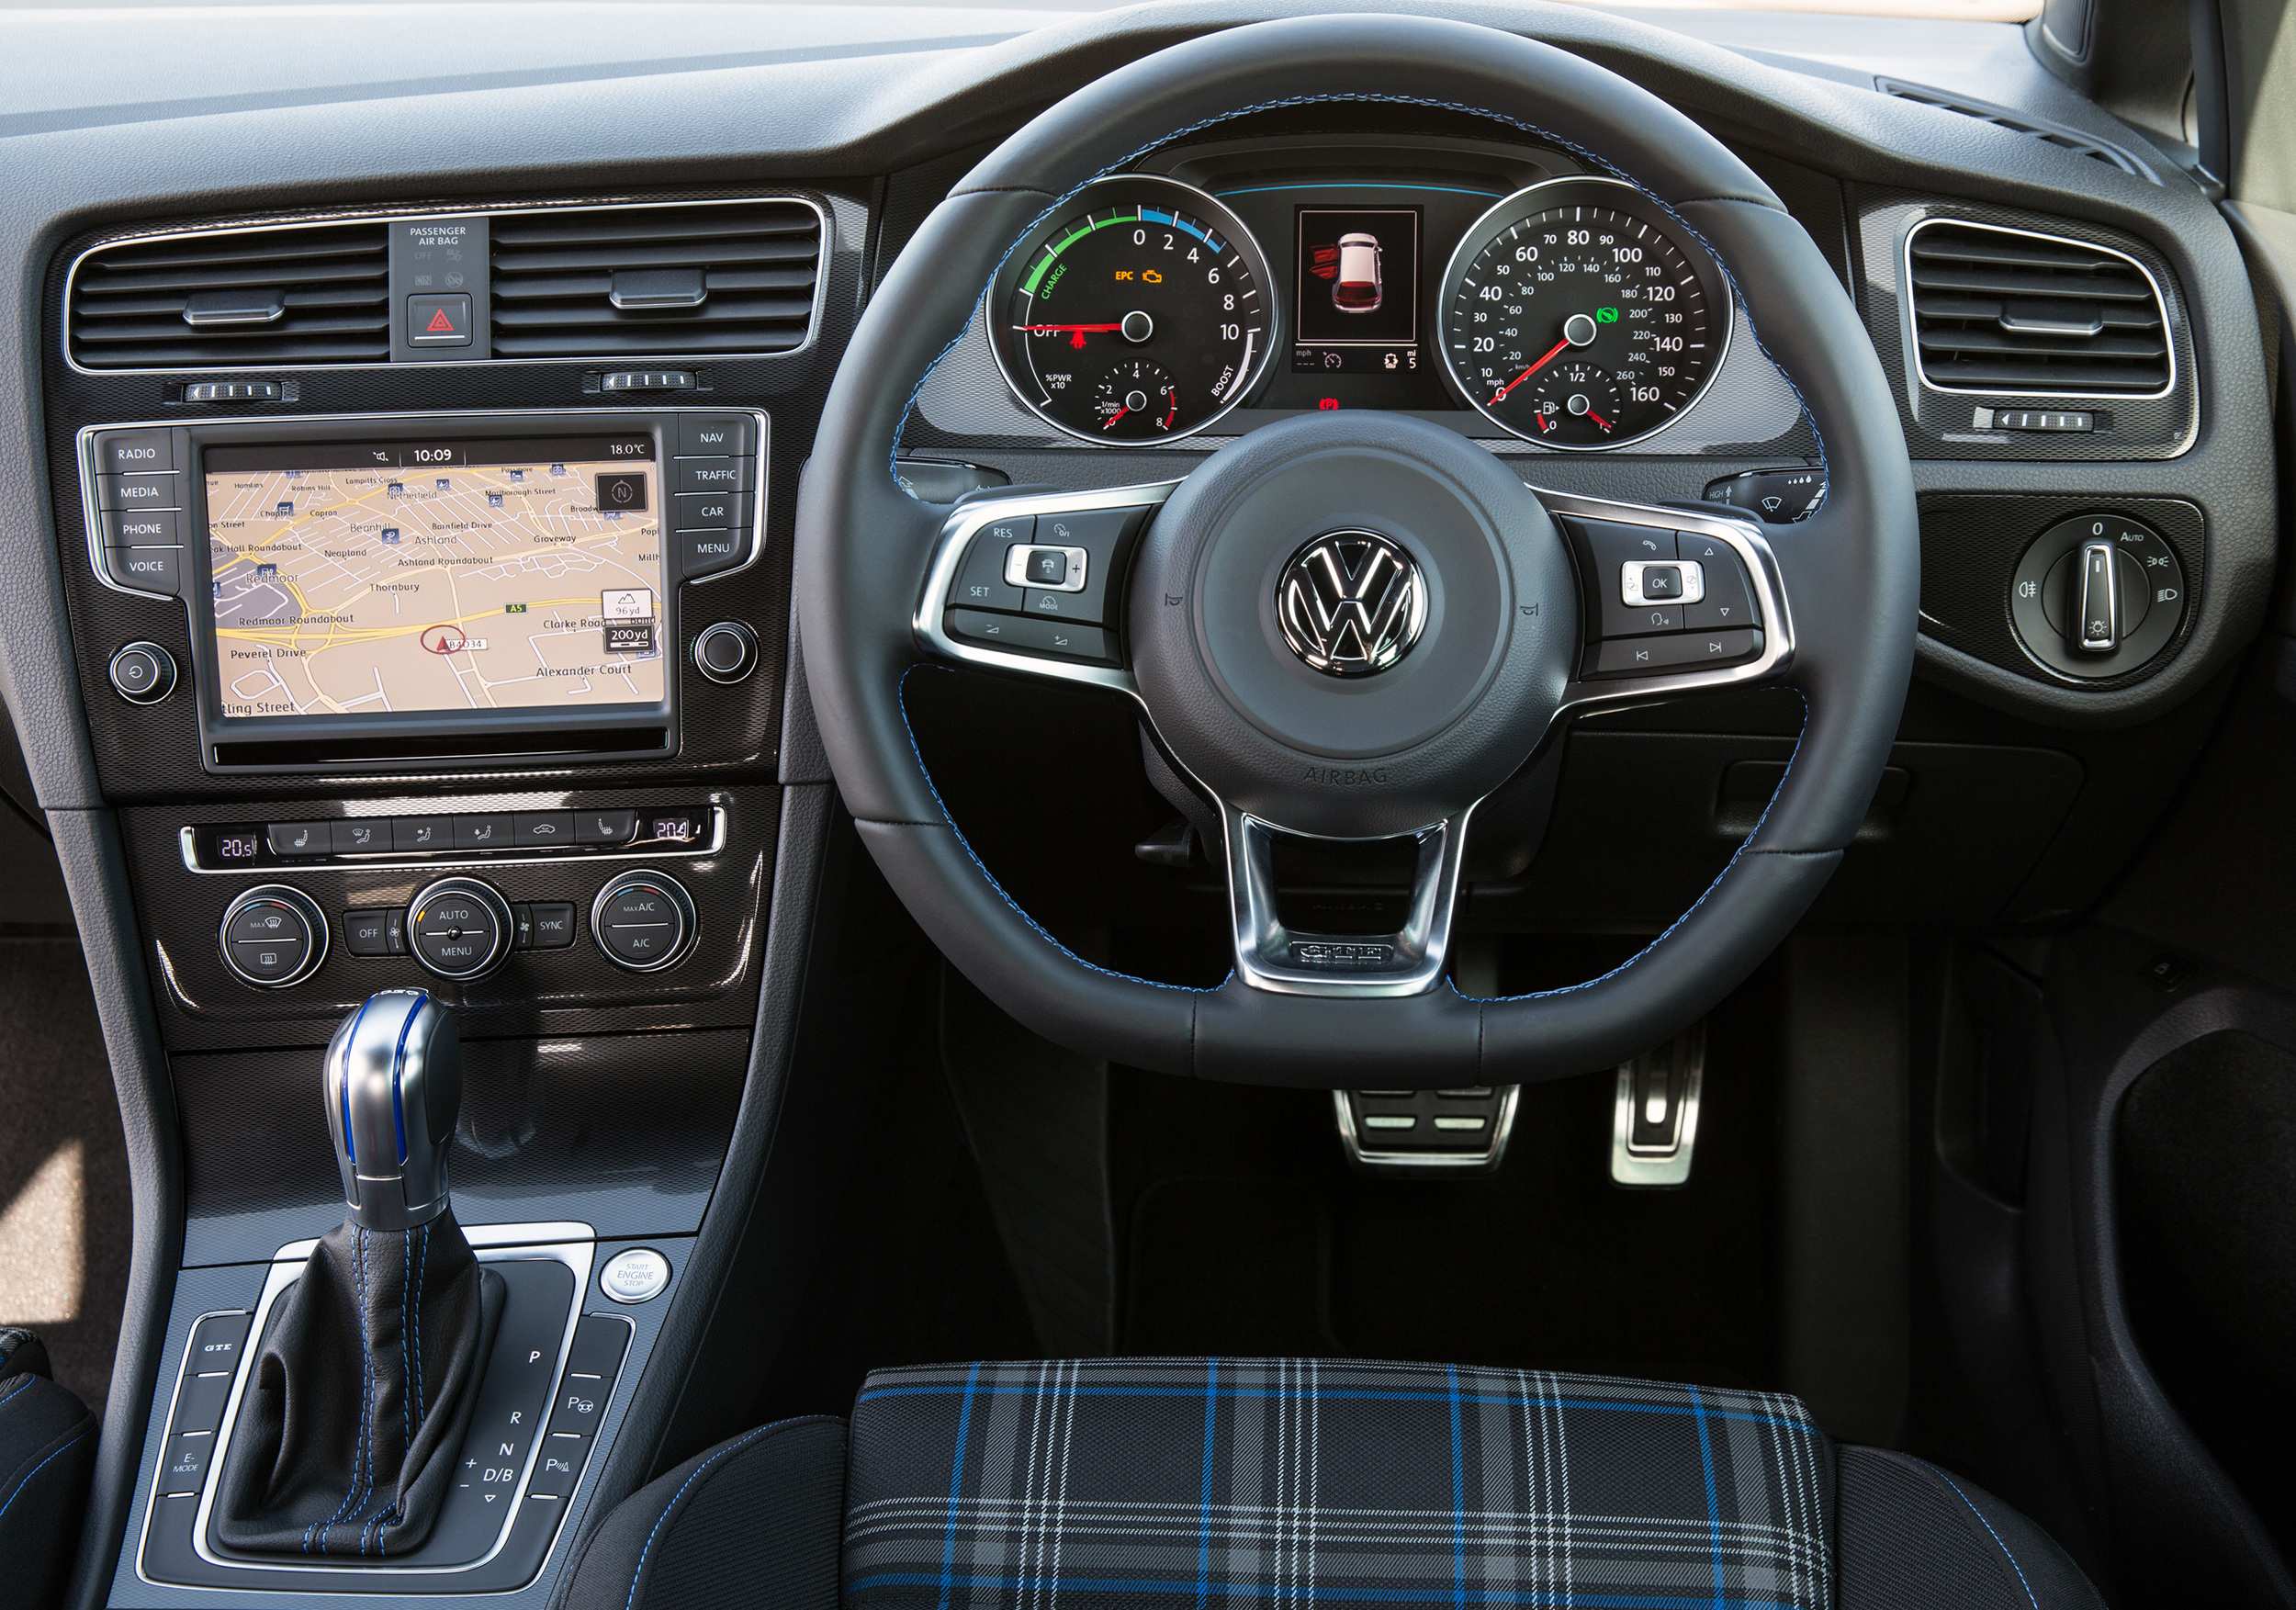 VW_7061.jpg